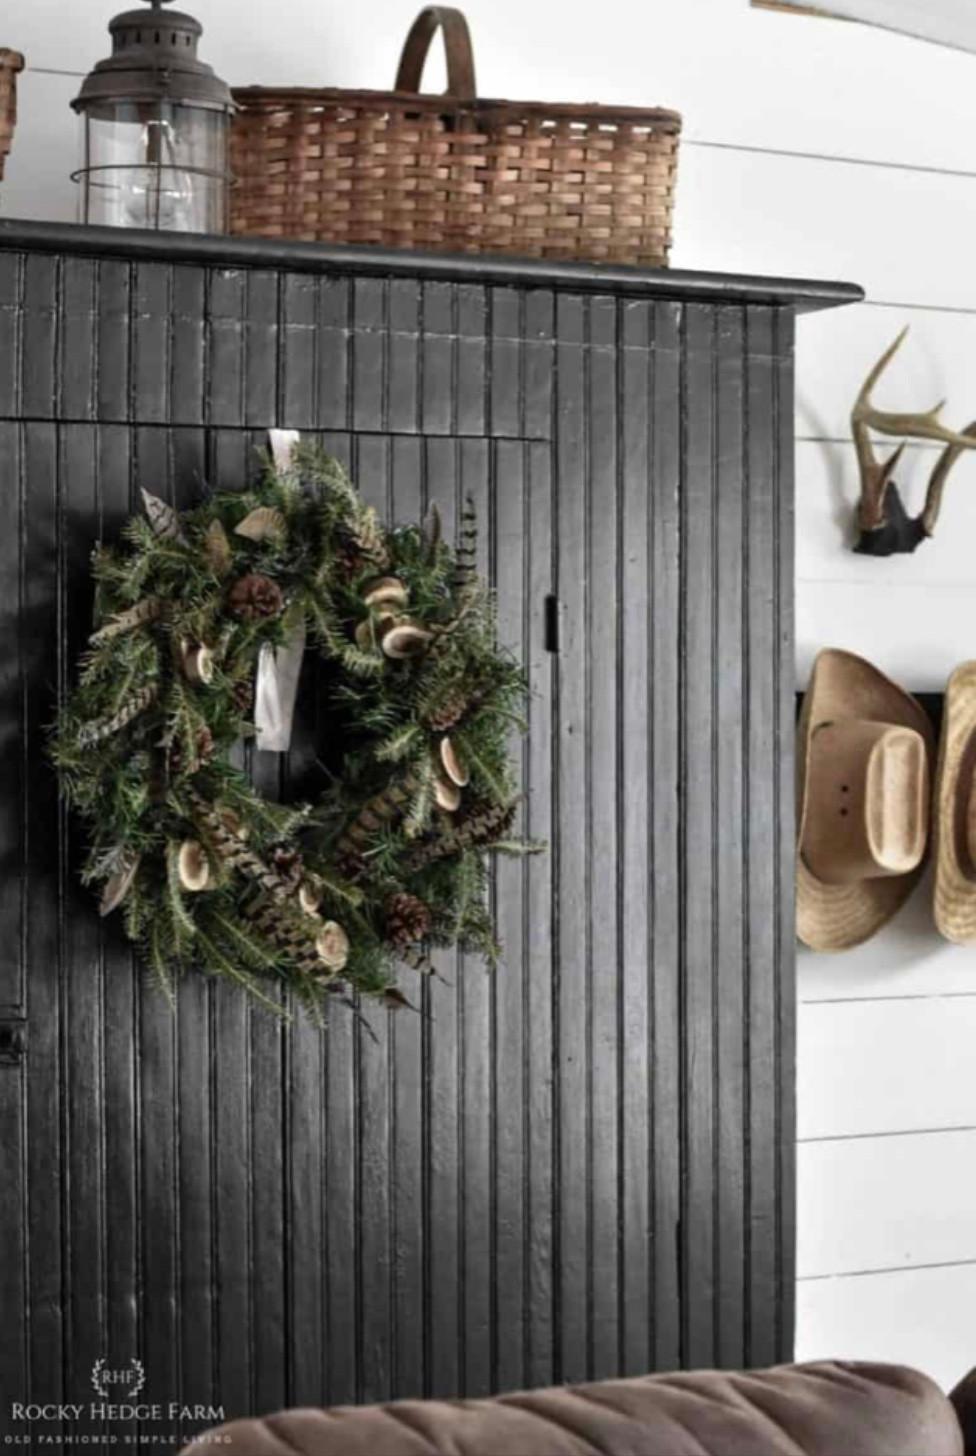 DIY Rustic Woodland Winter Wreath